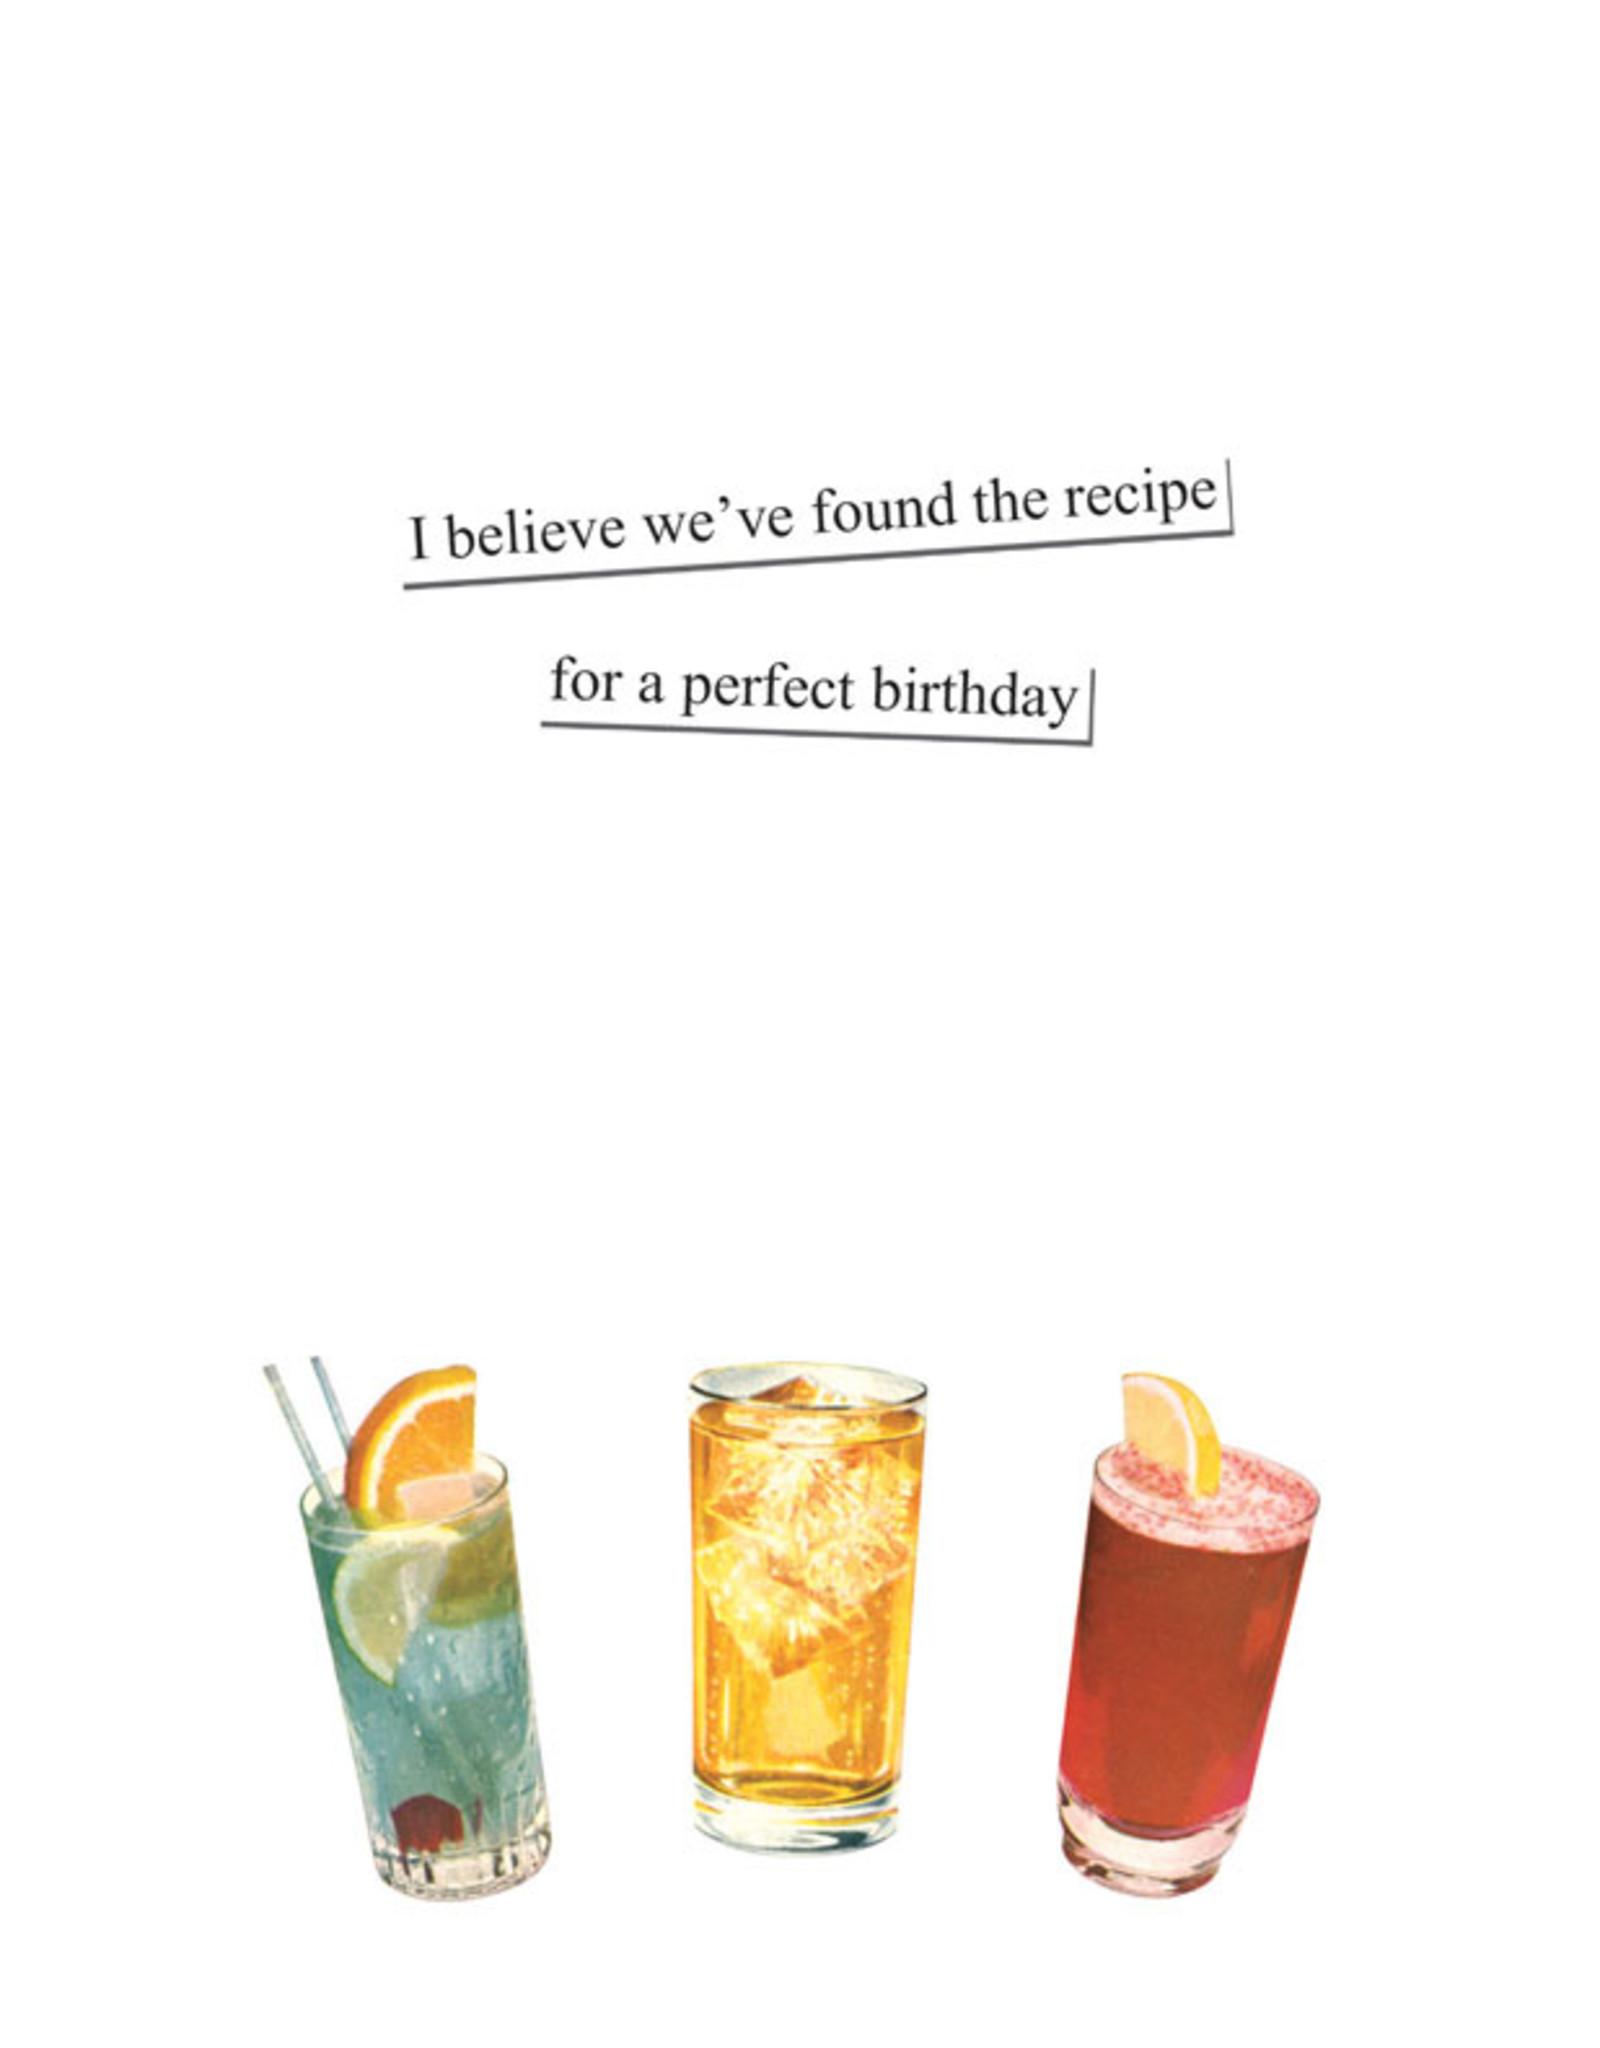 Anne Taintor Birthday Card -  Stir Up